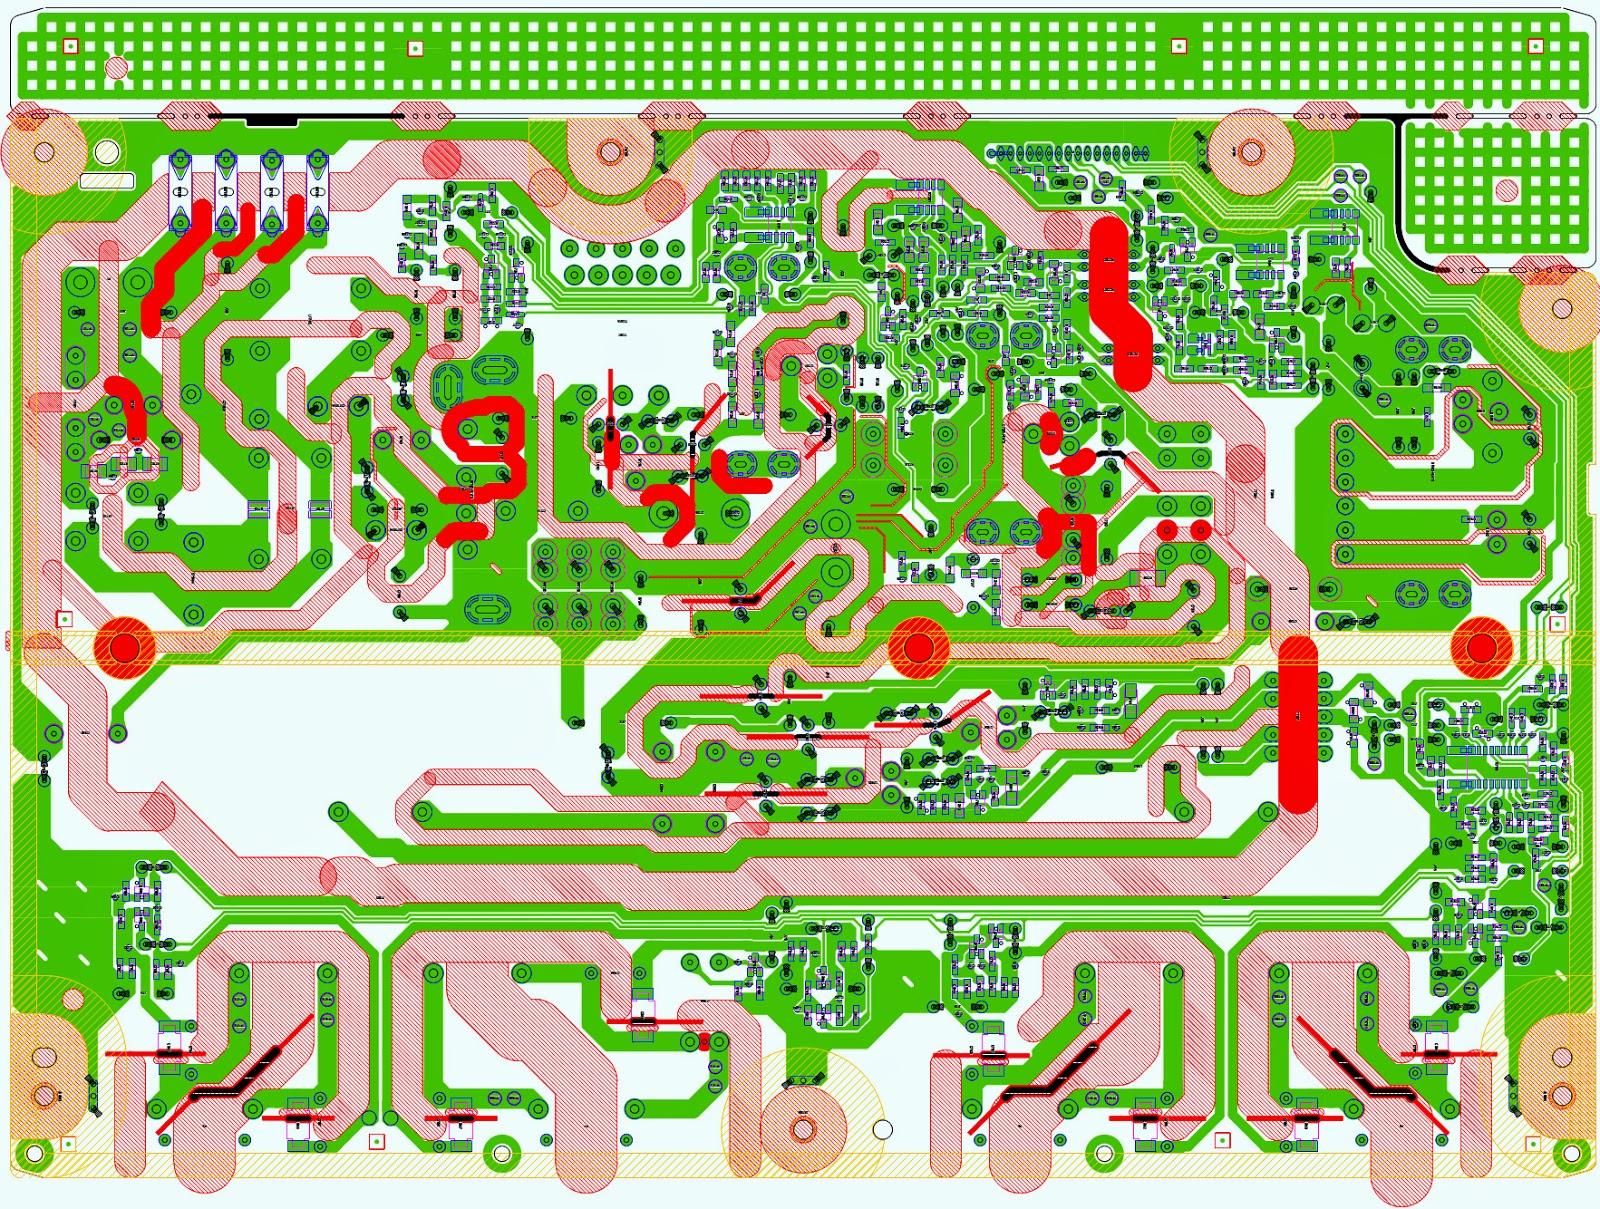 panasonic tc l32c30b lcd tv power supply schematic. Black Bedroom Furniture Sets. Home Design Ideas